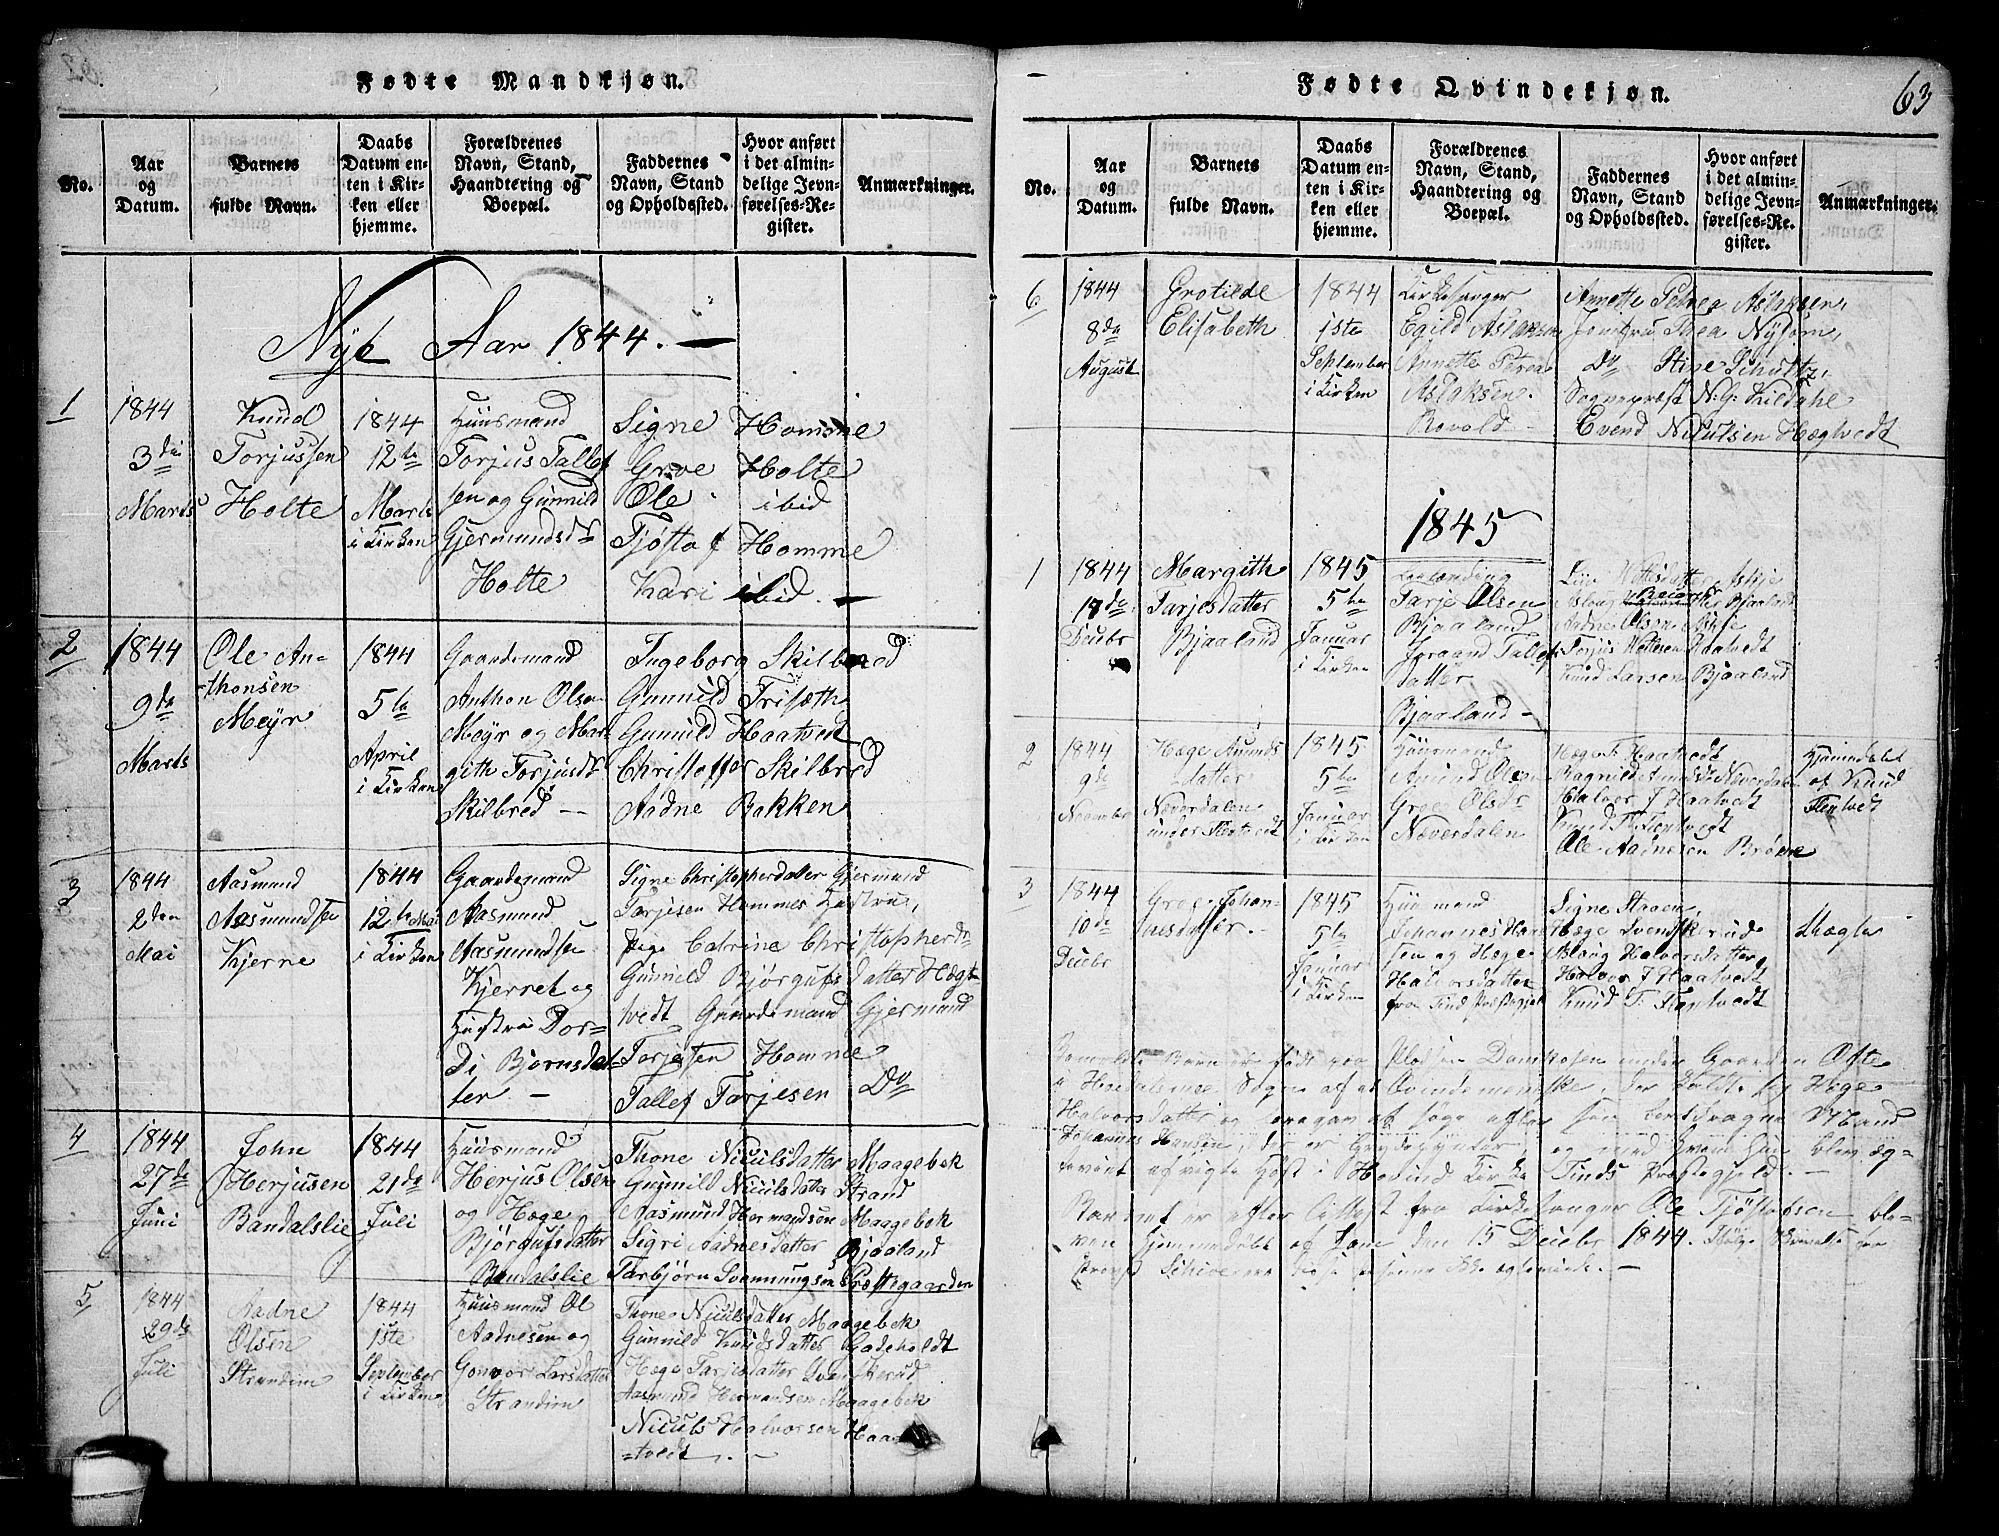 SAKO, Lårdal kirkebøker, G/Ga/L0001: Klokkerbok nr. I 1, 1815-1861, s. 63